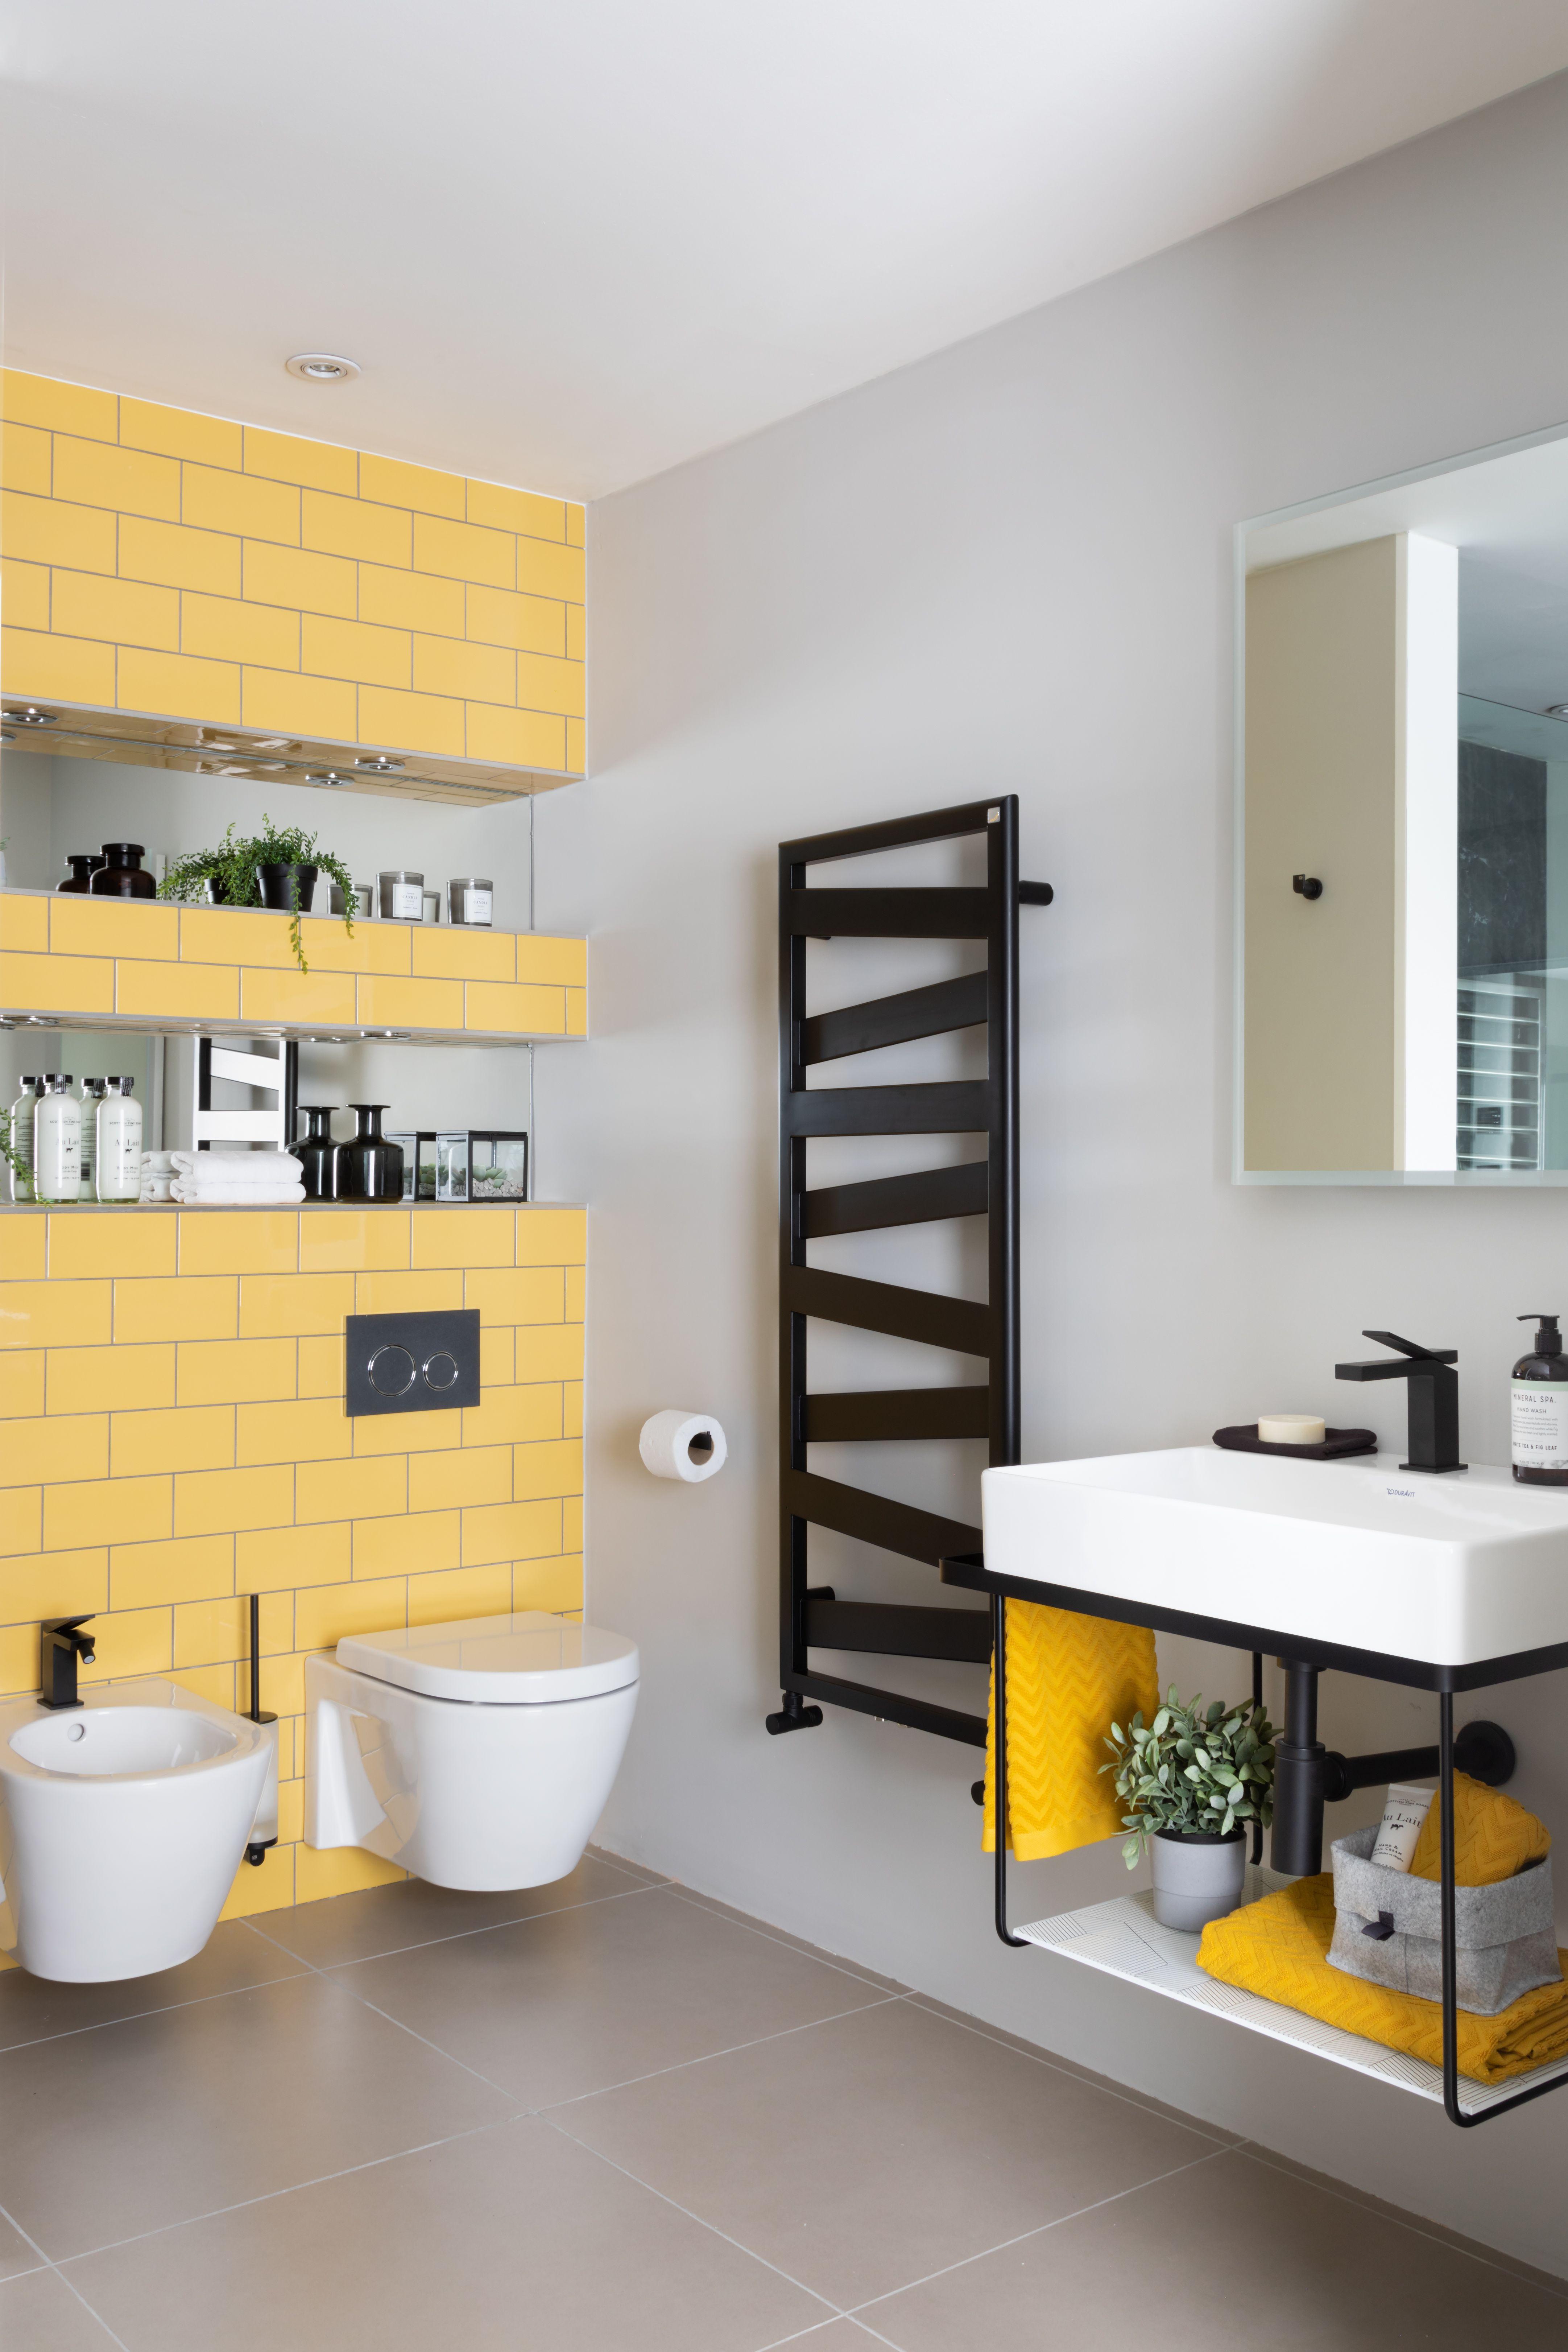 Yellow Bathroom Monochrome Tiles Luxury Smallbathroom Towelrail Design Plans Ideas Yellow Bathrooms Yellow Bathroom Tiles Bathroom Design Bathroom redecorating ideas png